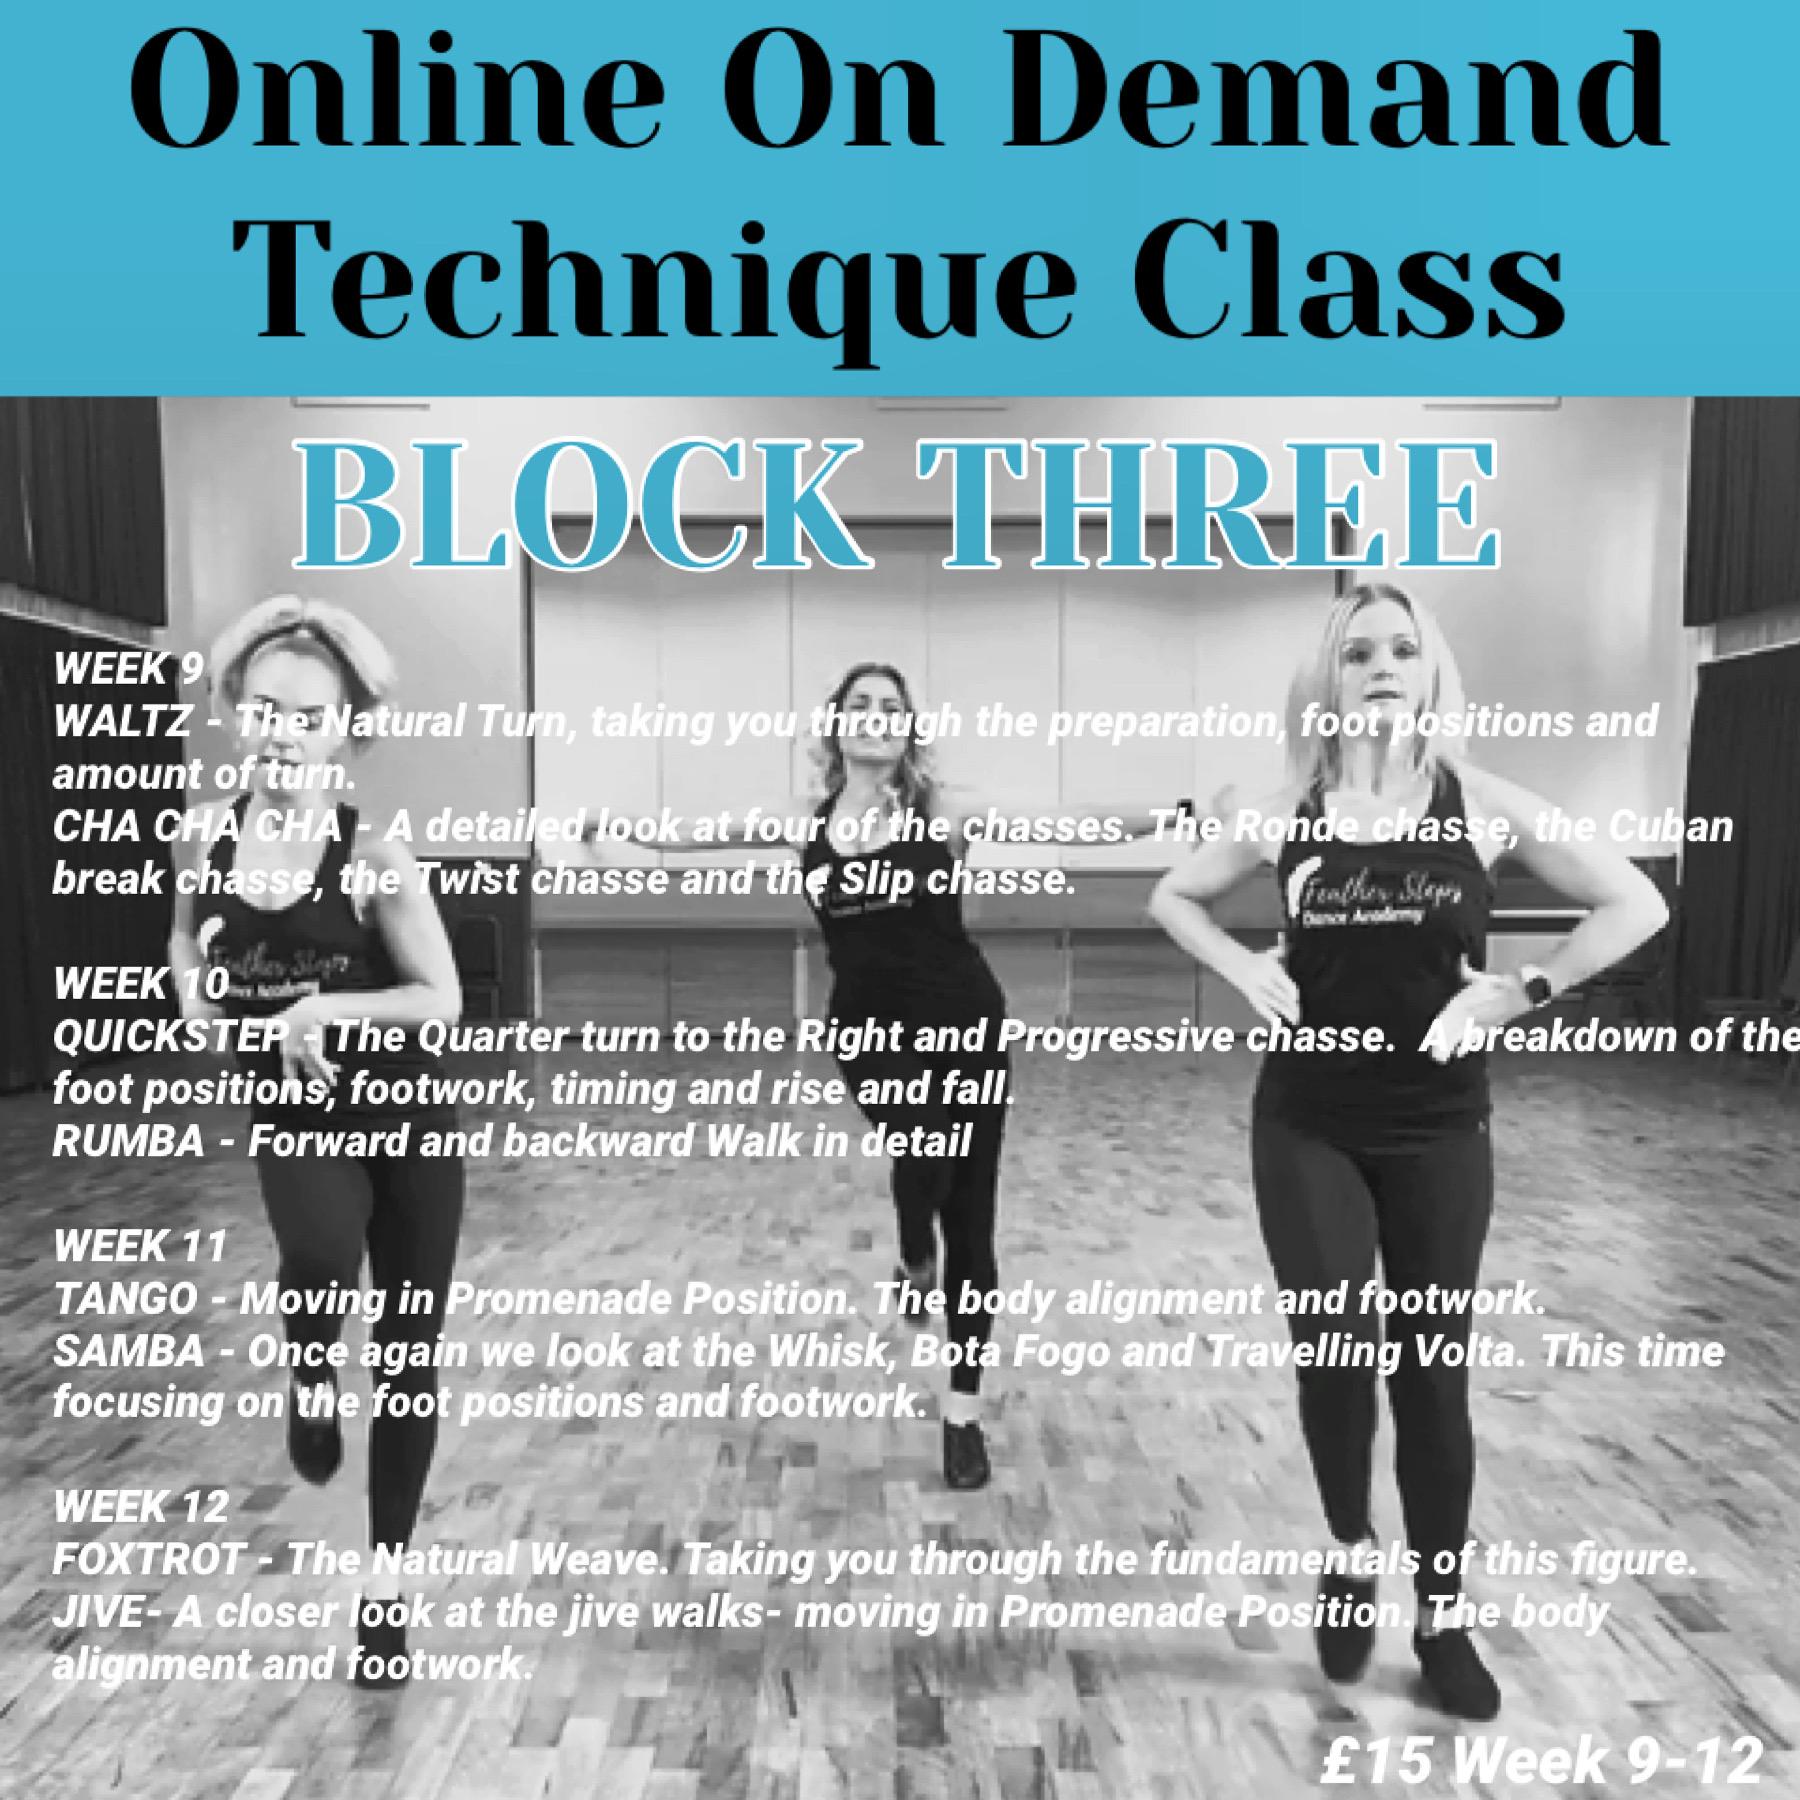 On demand Block 3